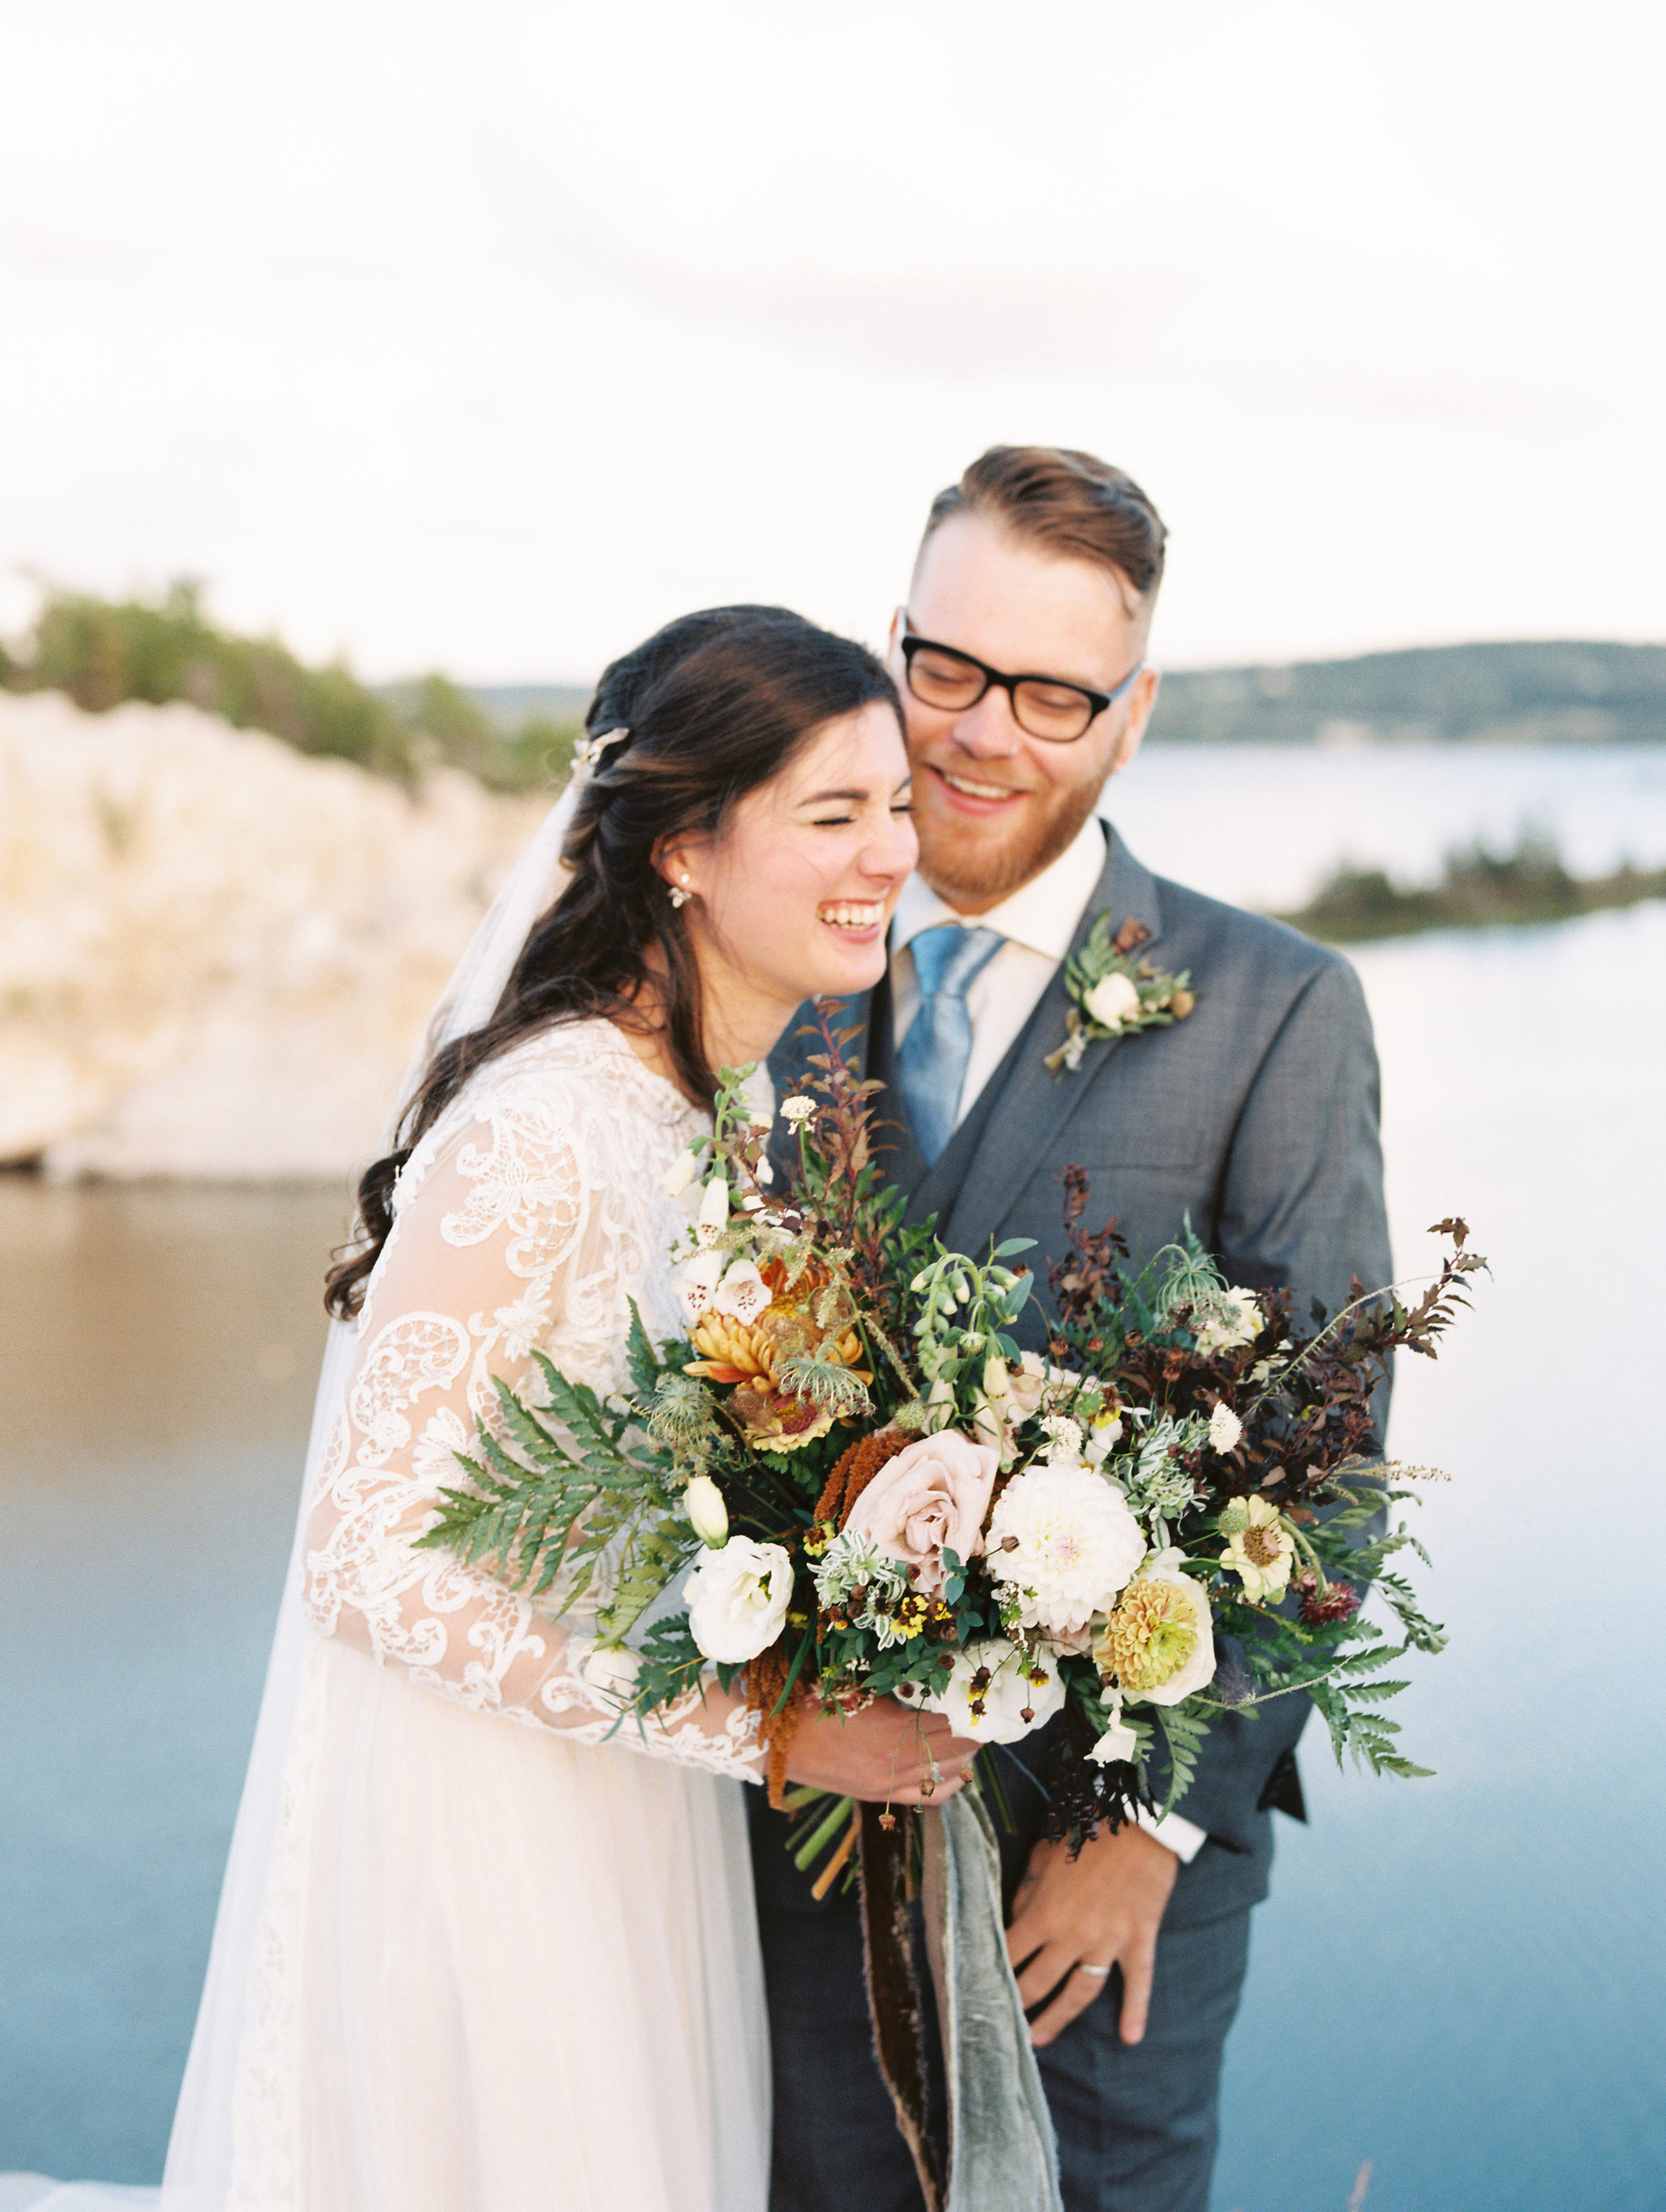 Natural, untamed bridal bouquet in neutral colors with sage green velvet ribbon. Nova Scotia Wedding Floral Design